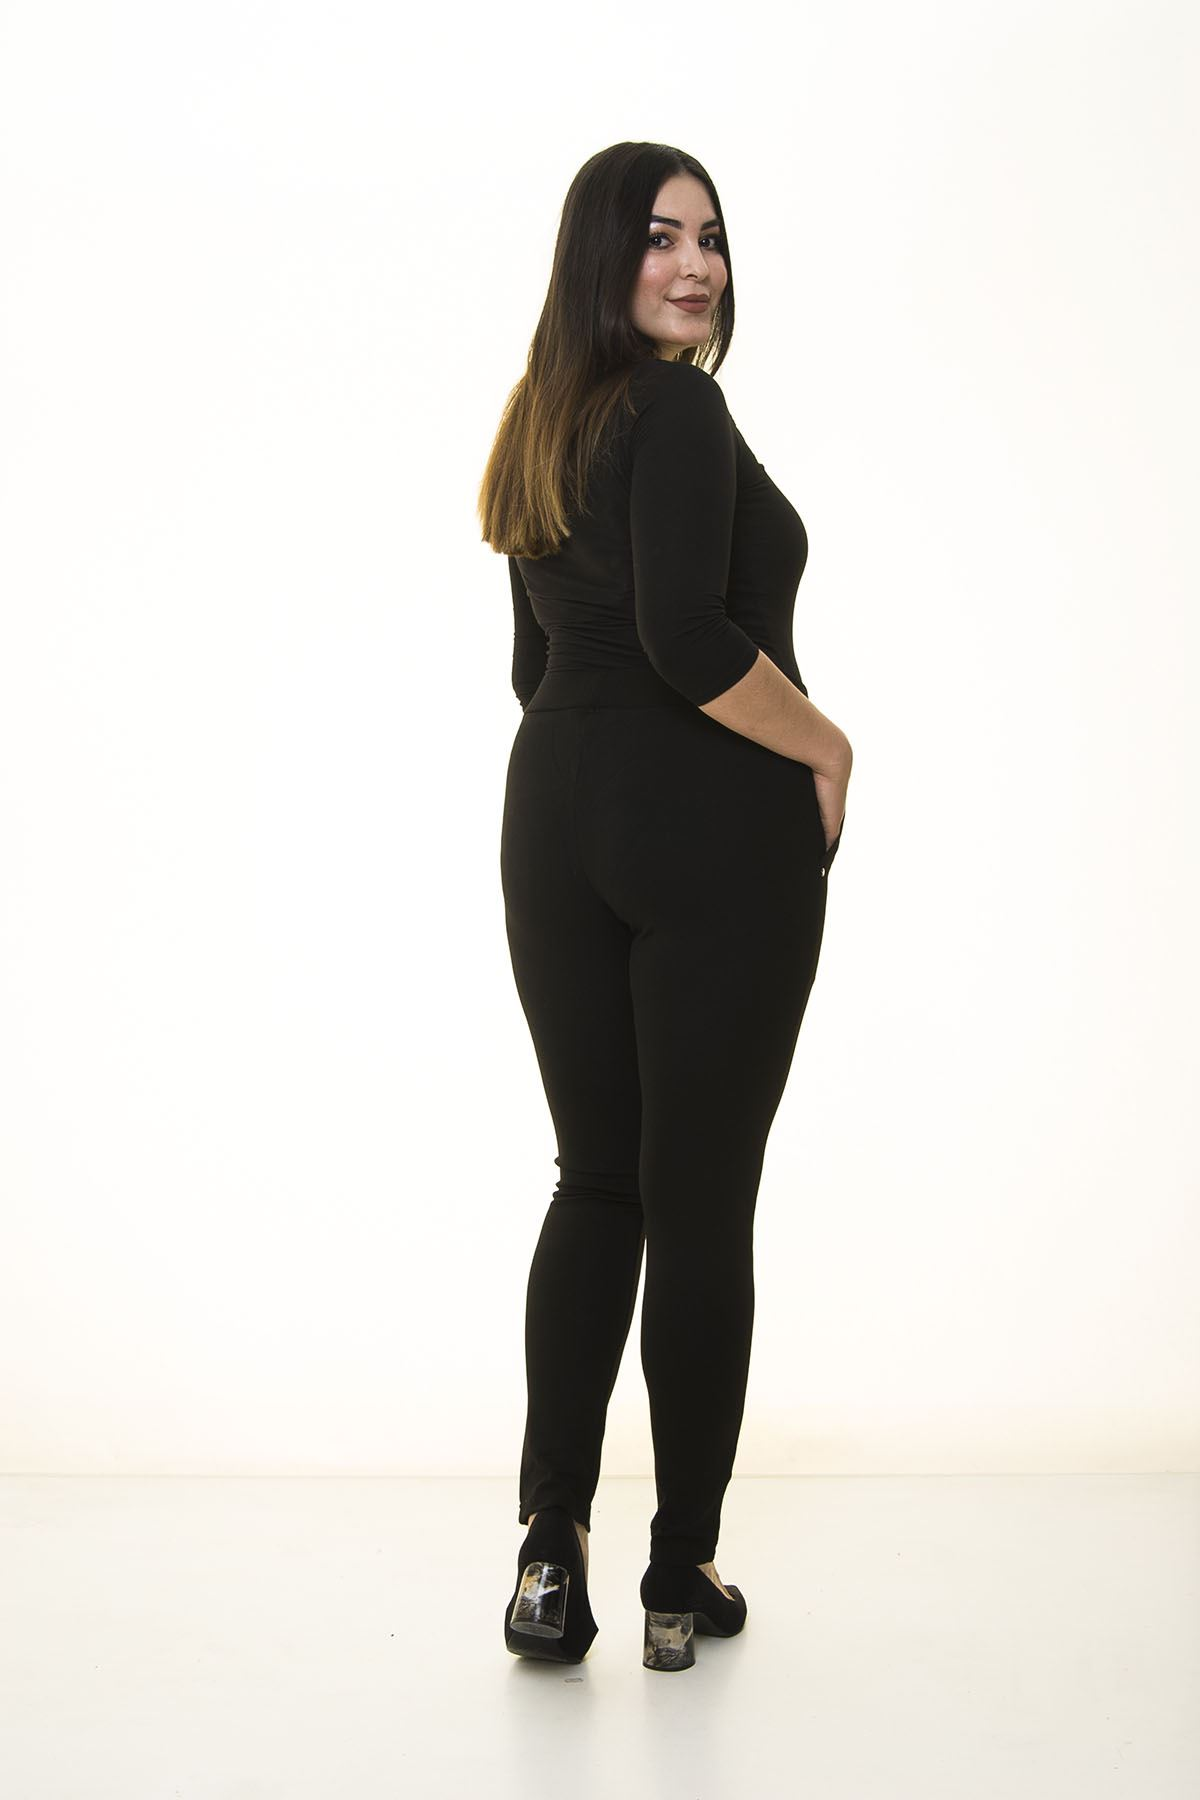 Siyah Cepli Esnek Pantolon Tayt 34C-1373